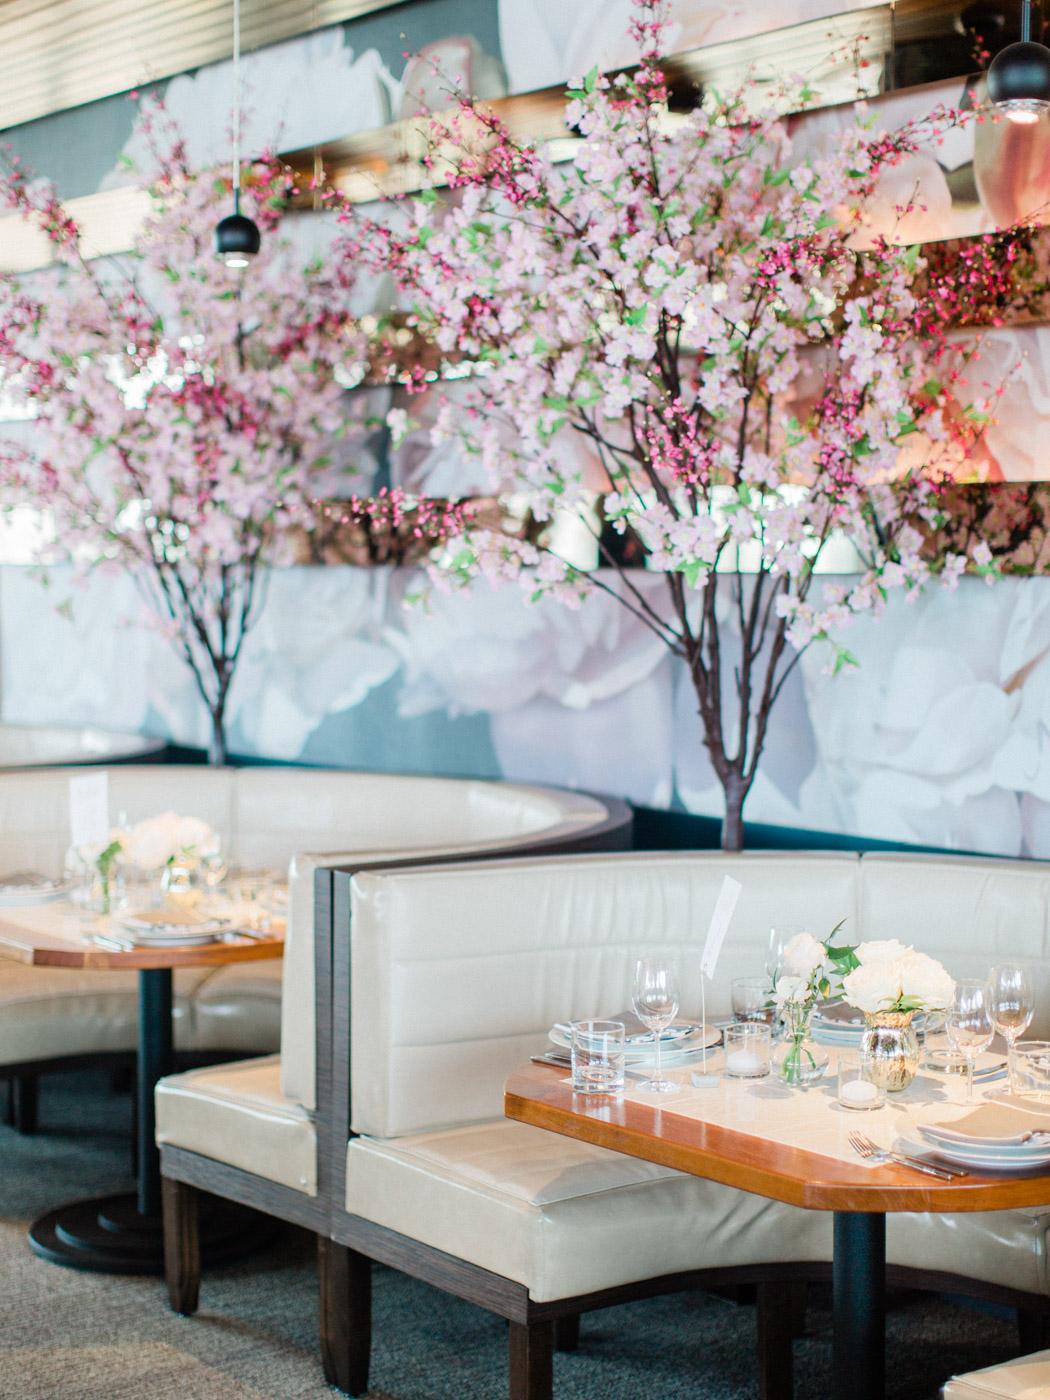 -Vogue inspired fine art wedding details at Lavelle Restaurant, downtown toronto.  Captured by Toronto wedding photographer Corynn Fowler Photography.